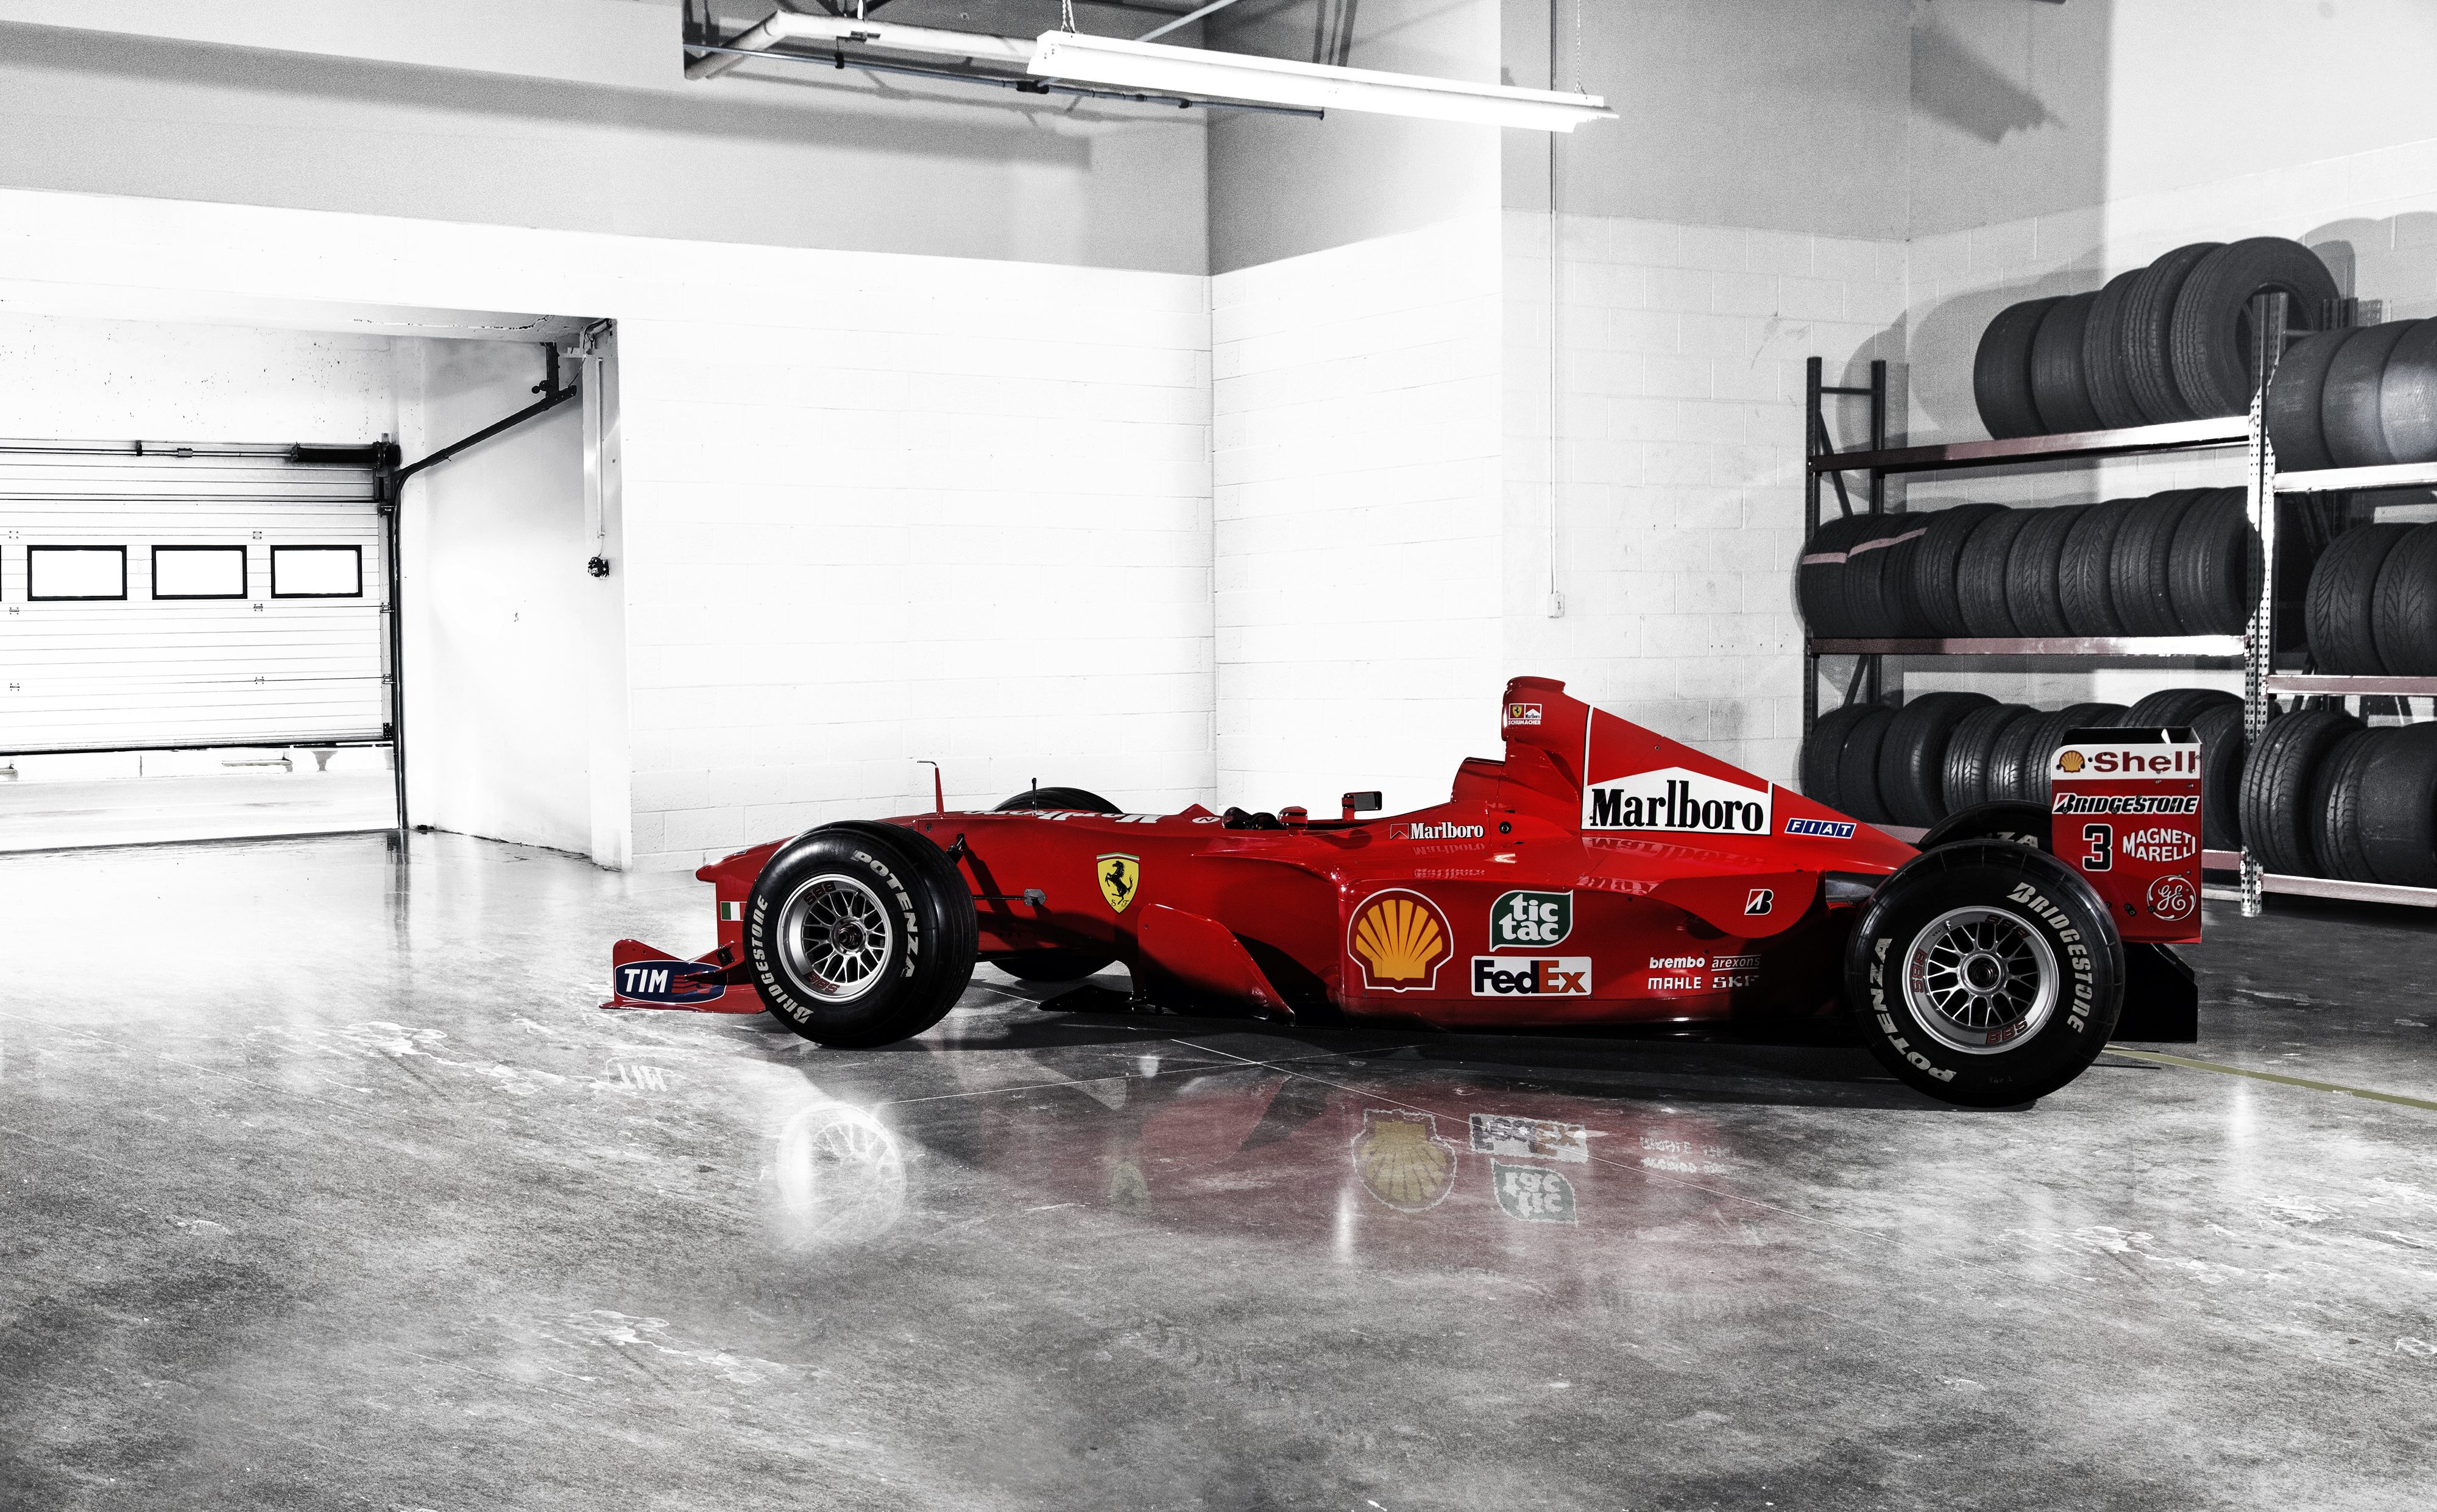 F1 4k Ultra HD Wallpaper | Background Image | 4000x2482 ...